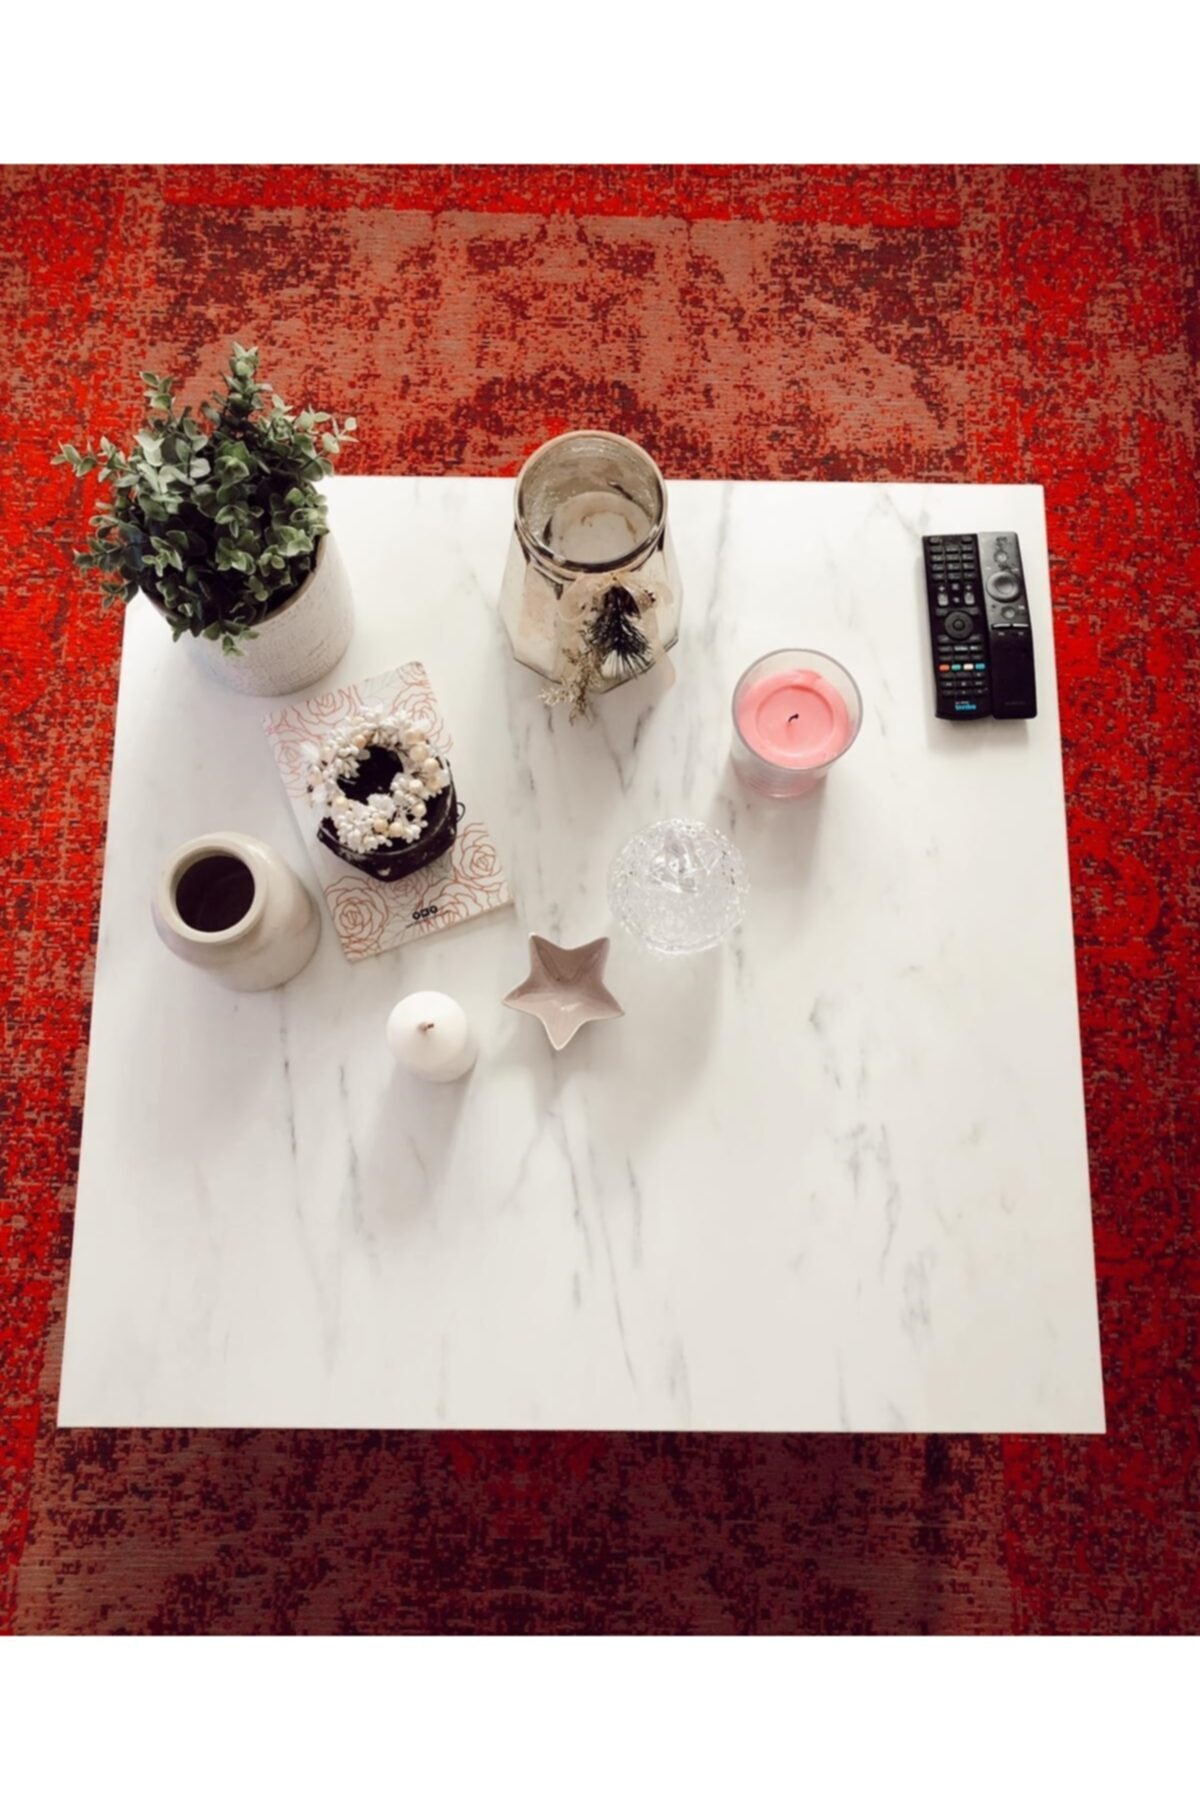 dekozem Beyaz Mermer Desen Orta Sehpa 75x75x40 Dkzm-2021-byzmros